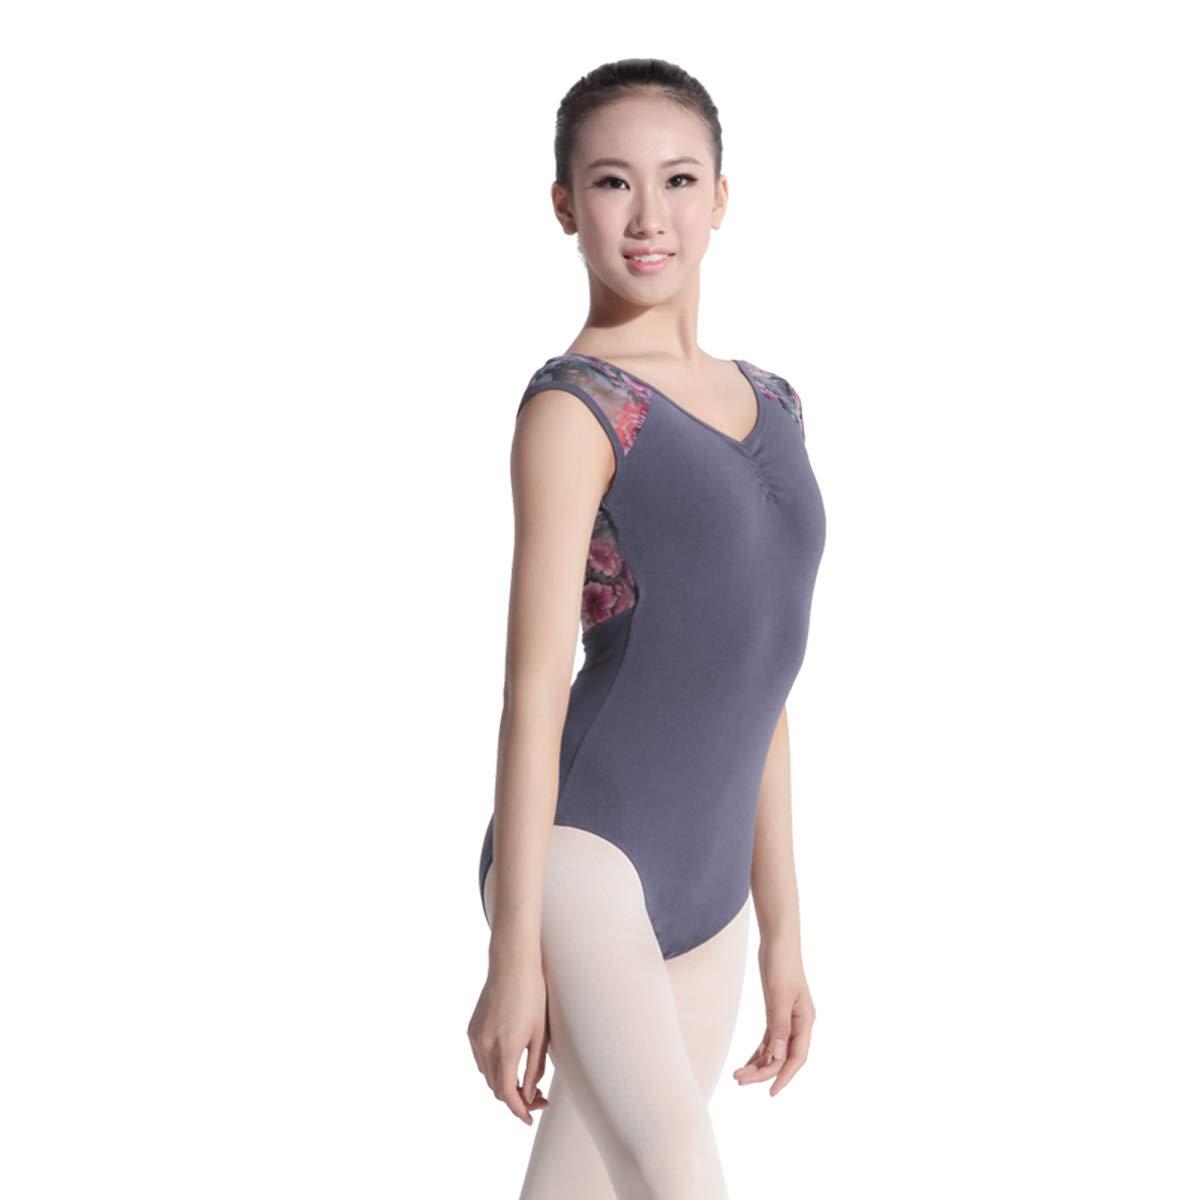 Baiwu Dance 116141052 メッシュ プリント レオタード フローラル レオタード レオタード (グレー、XL) B07G5KD1Y5